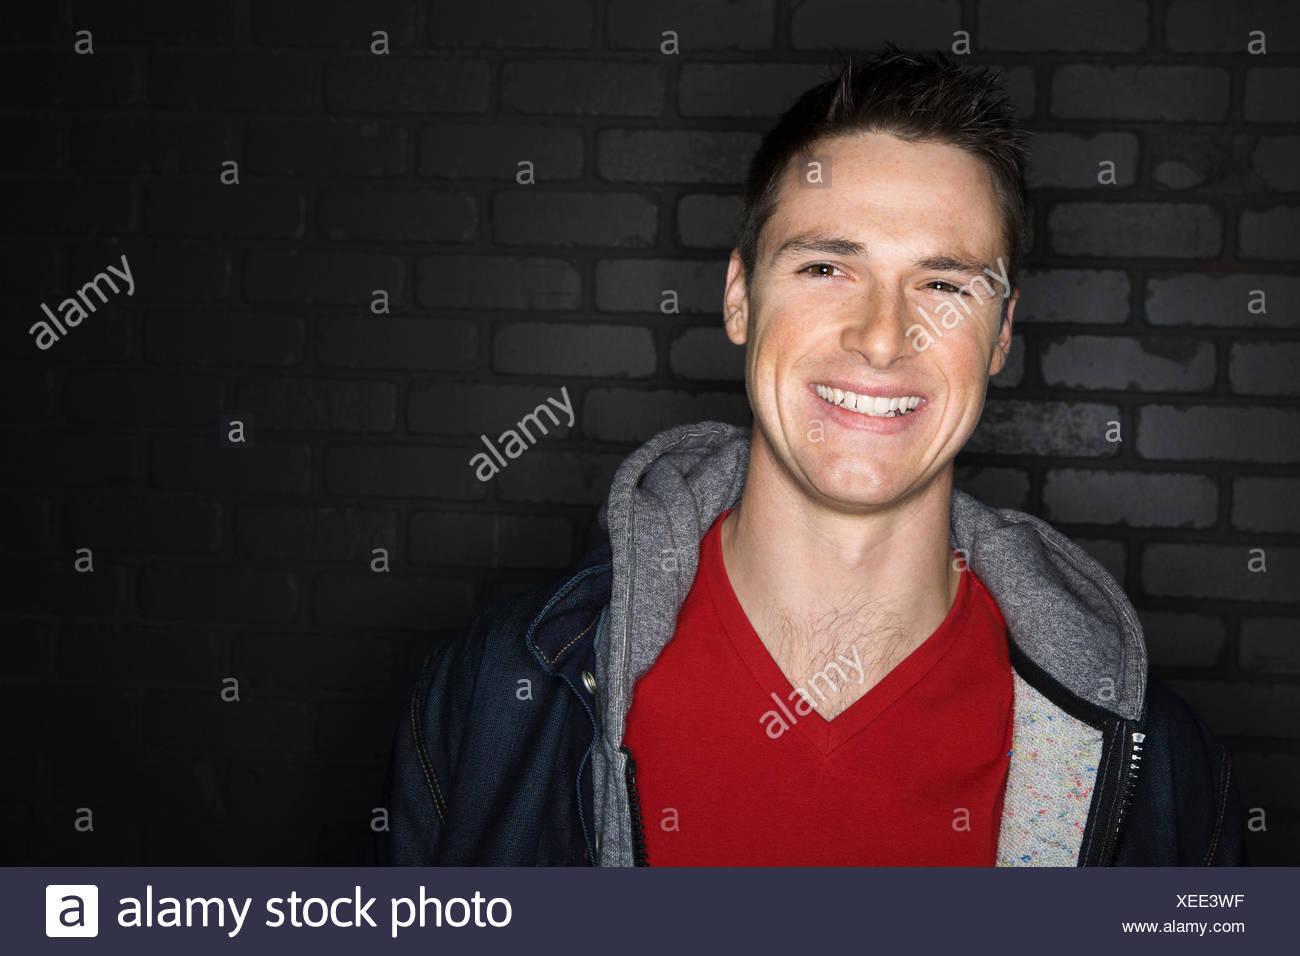 Portrait of smiling brunette man wearing jacket Stock Photo